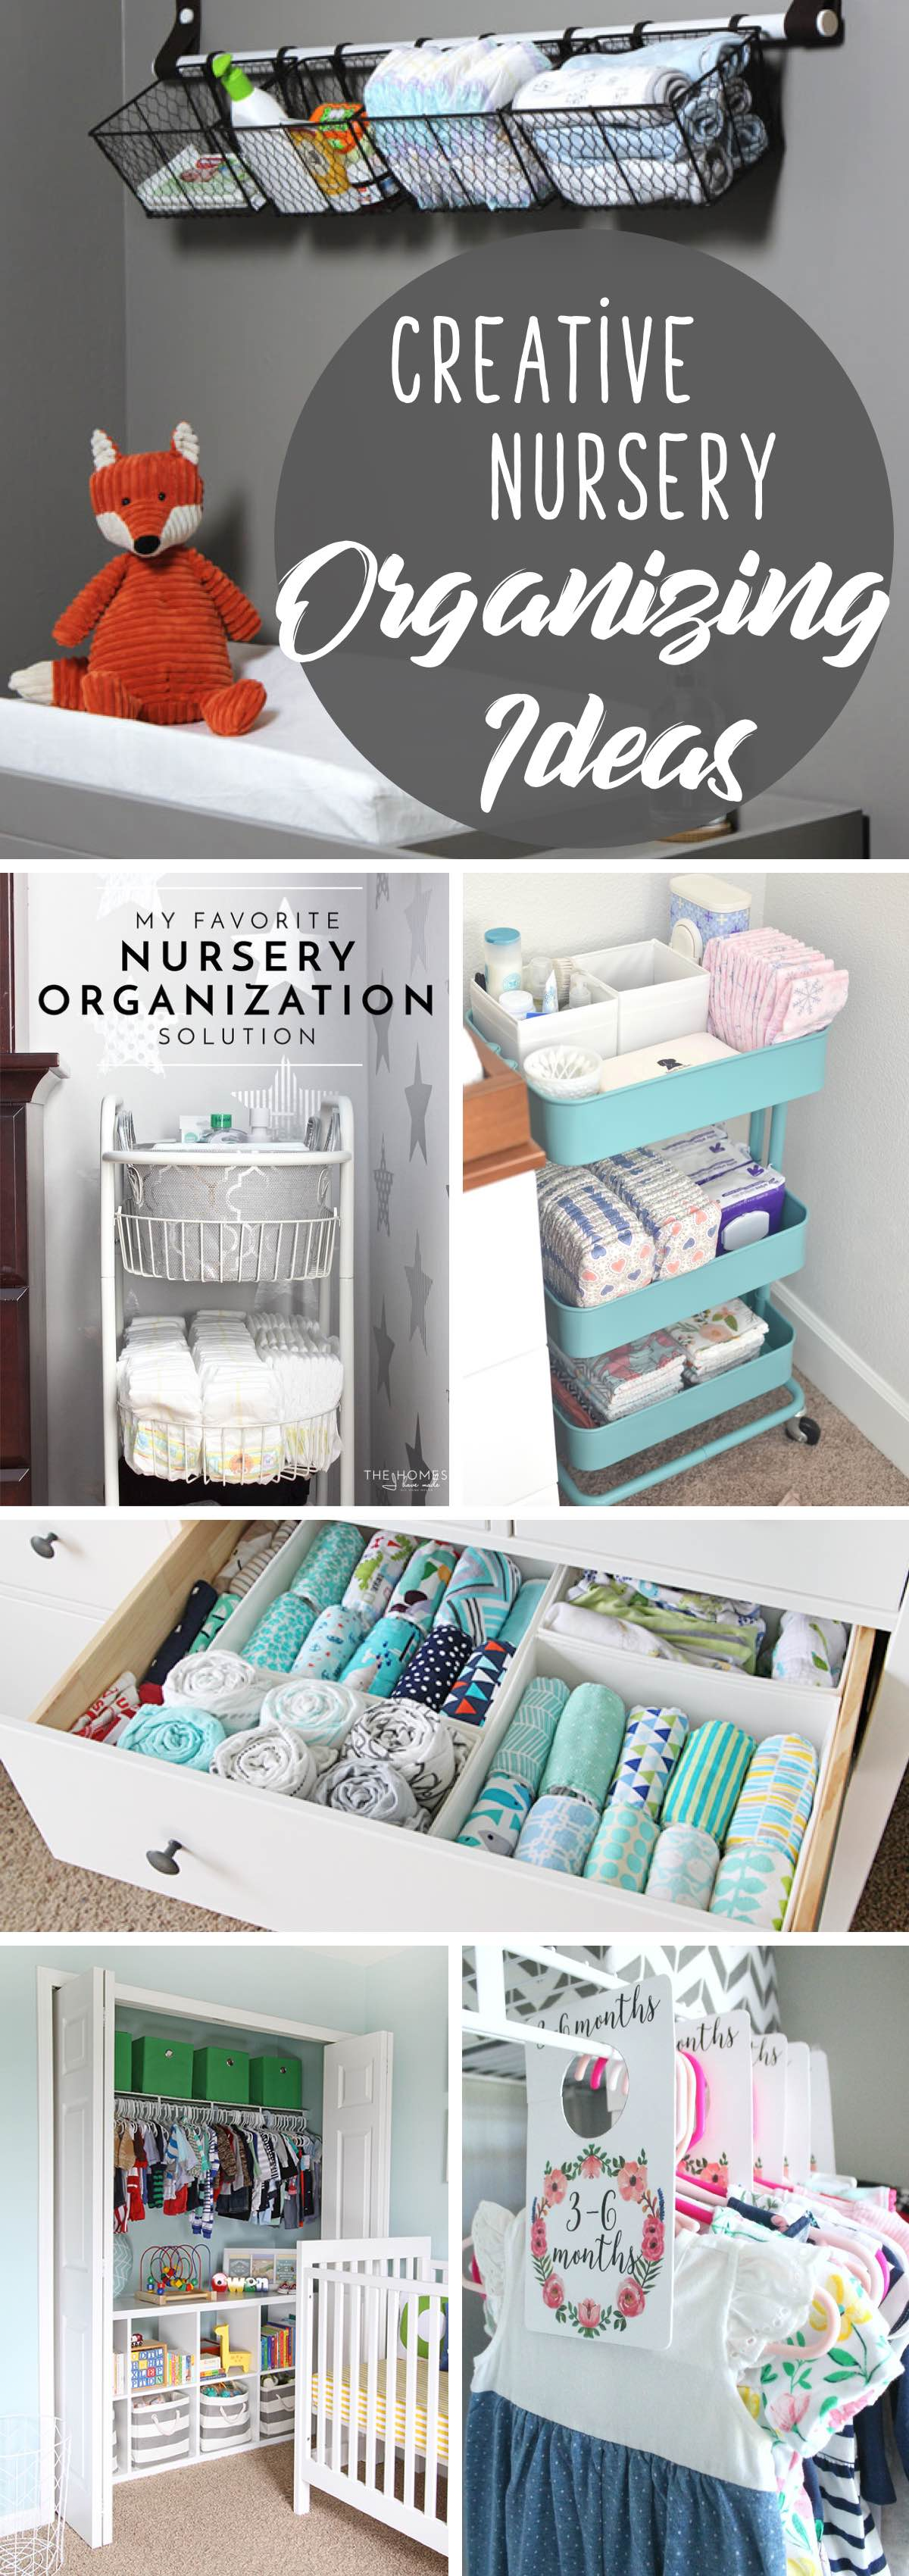 Nursery Organizing Ideas